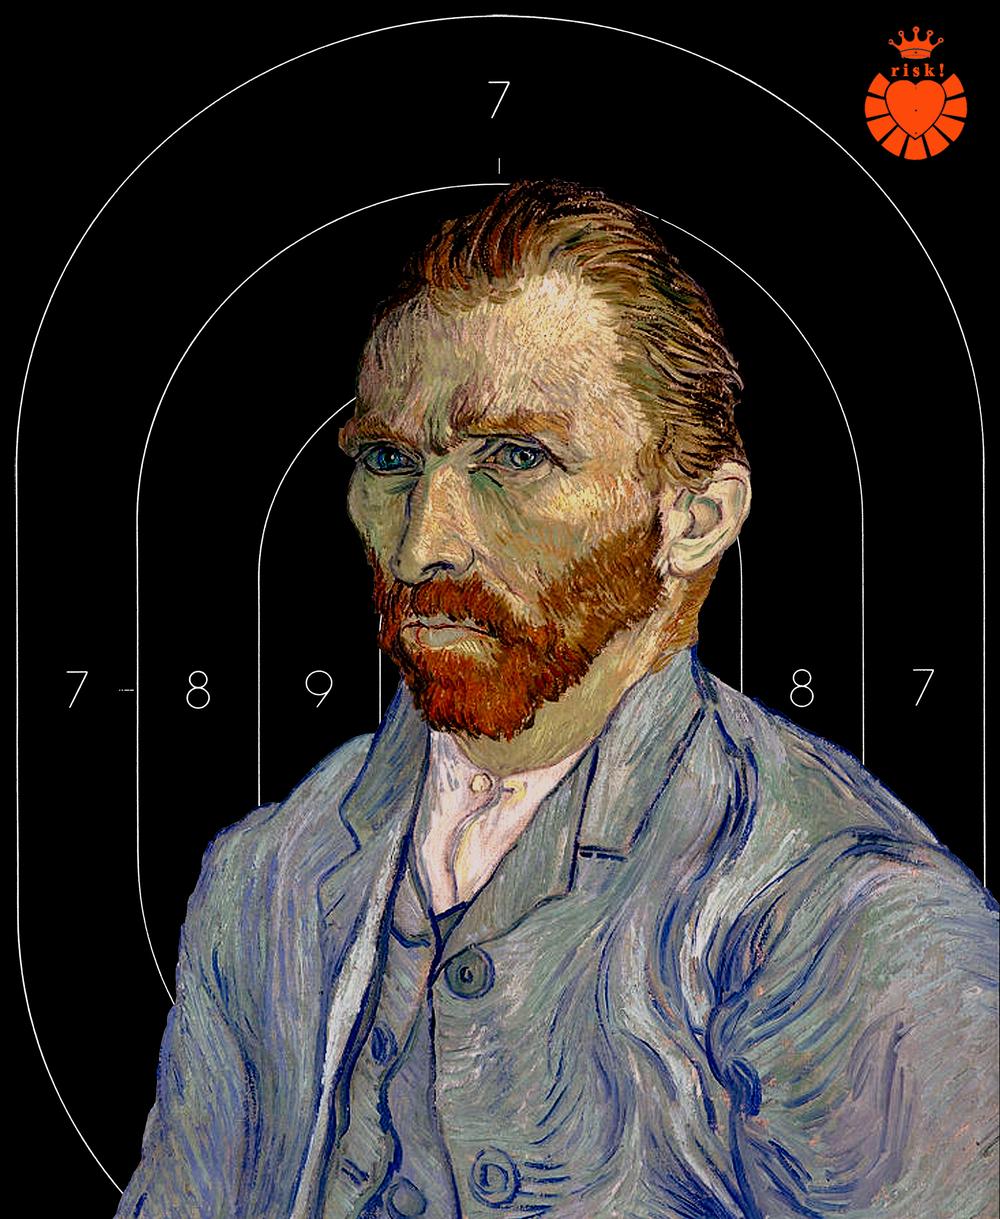 Van Gogh's Risk / 24 x 19 / Original Sold